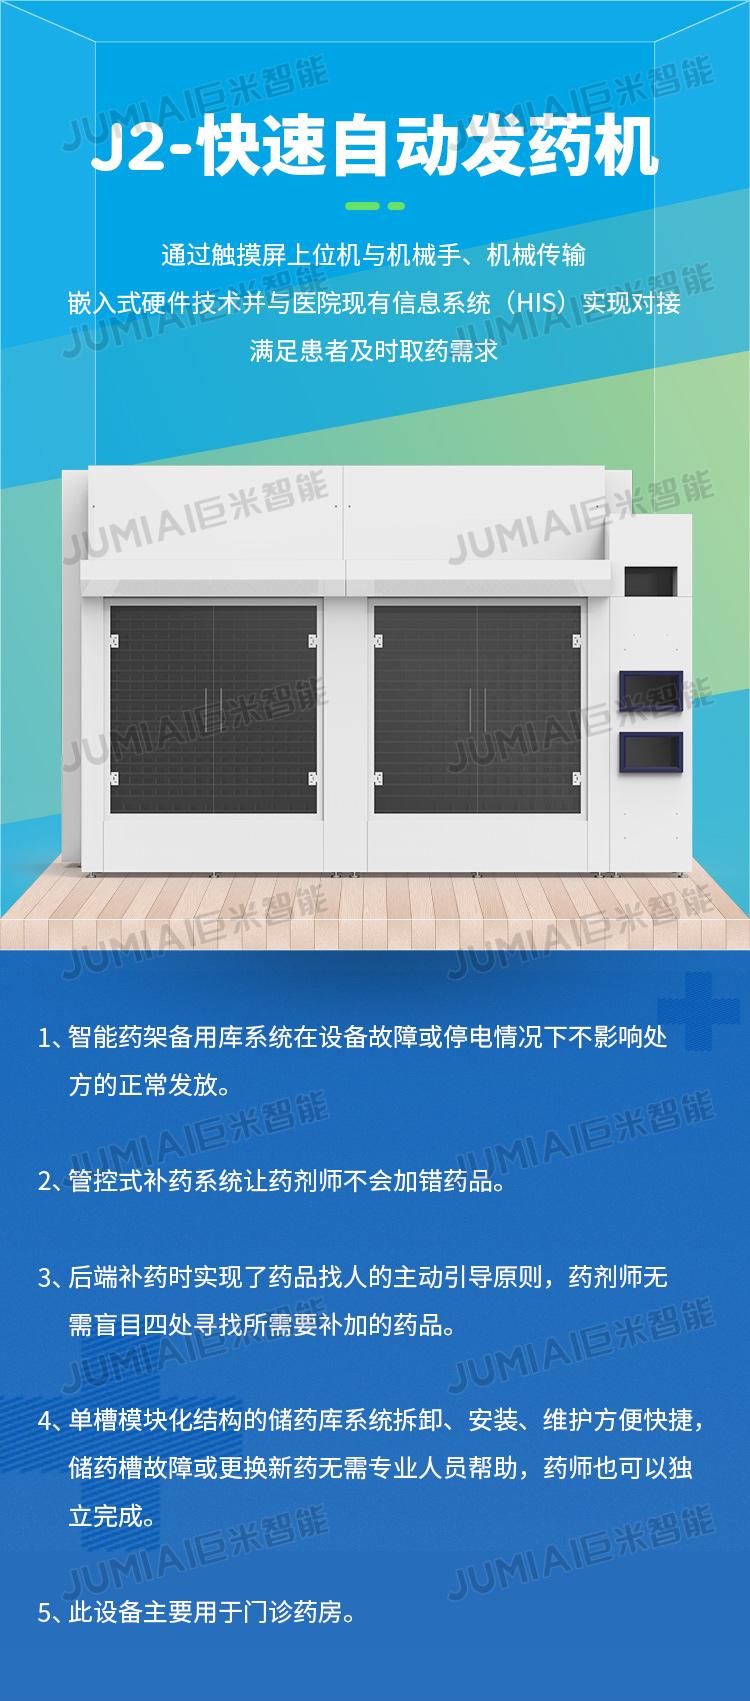 J2-快速自动发药机